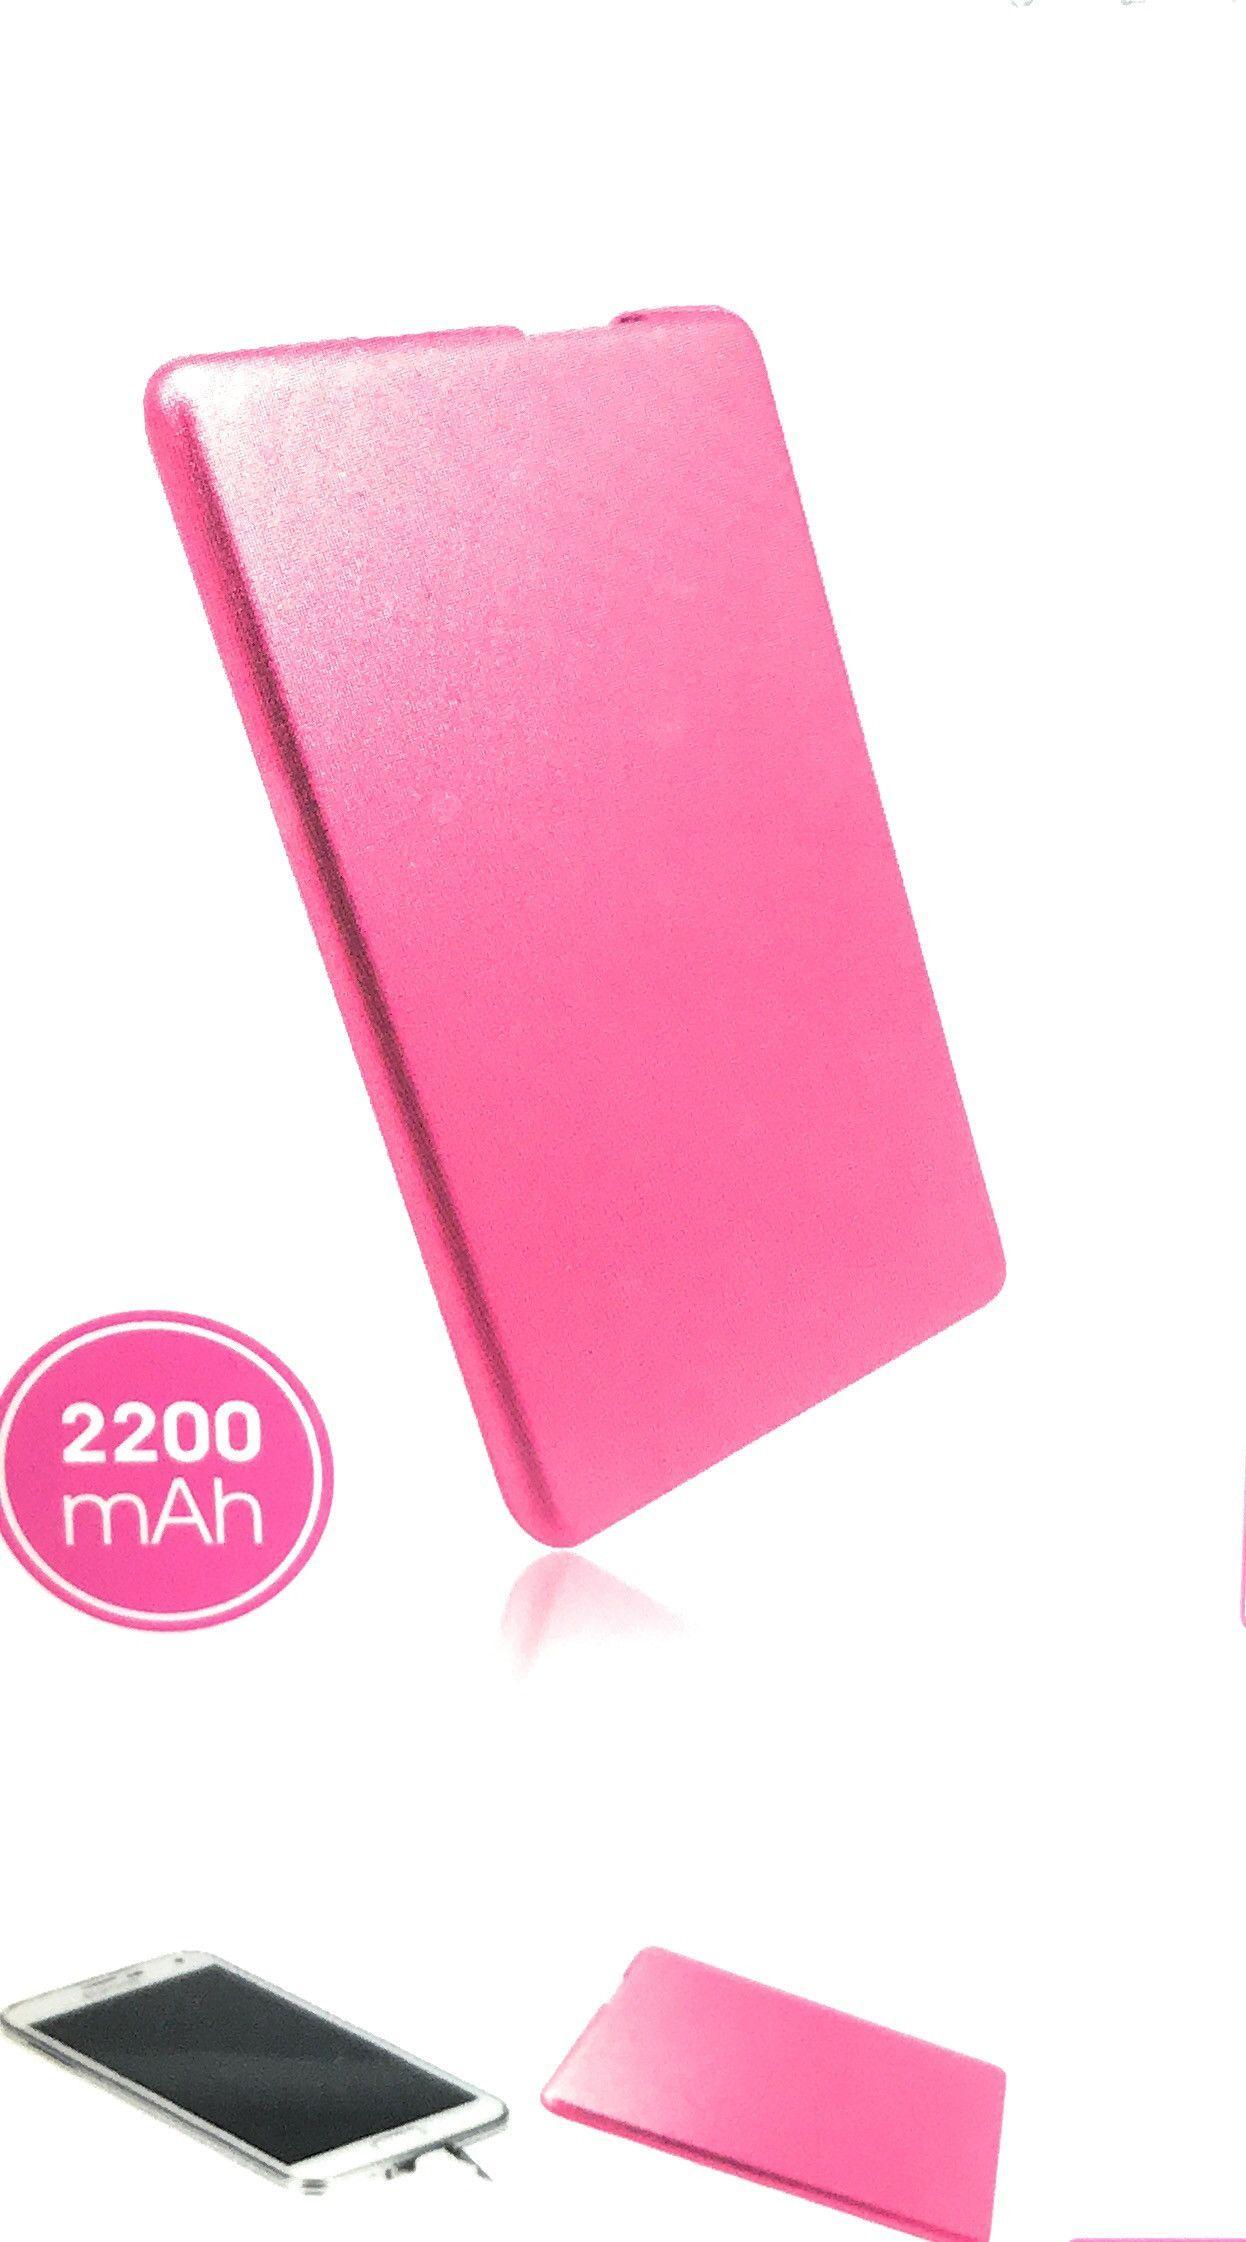 PdI Smart Phone Pocket Power Bank Ultra Slim, Pink